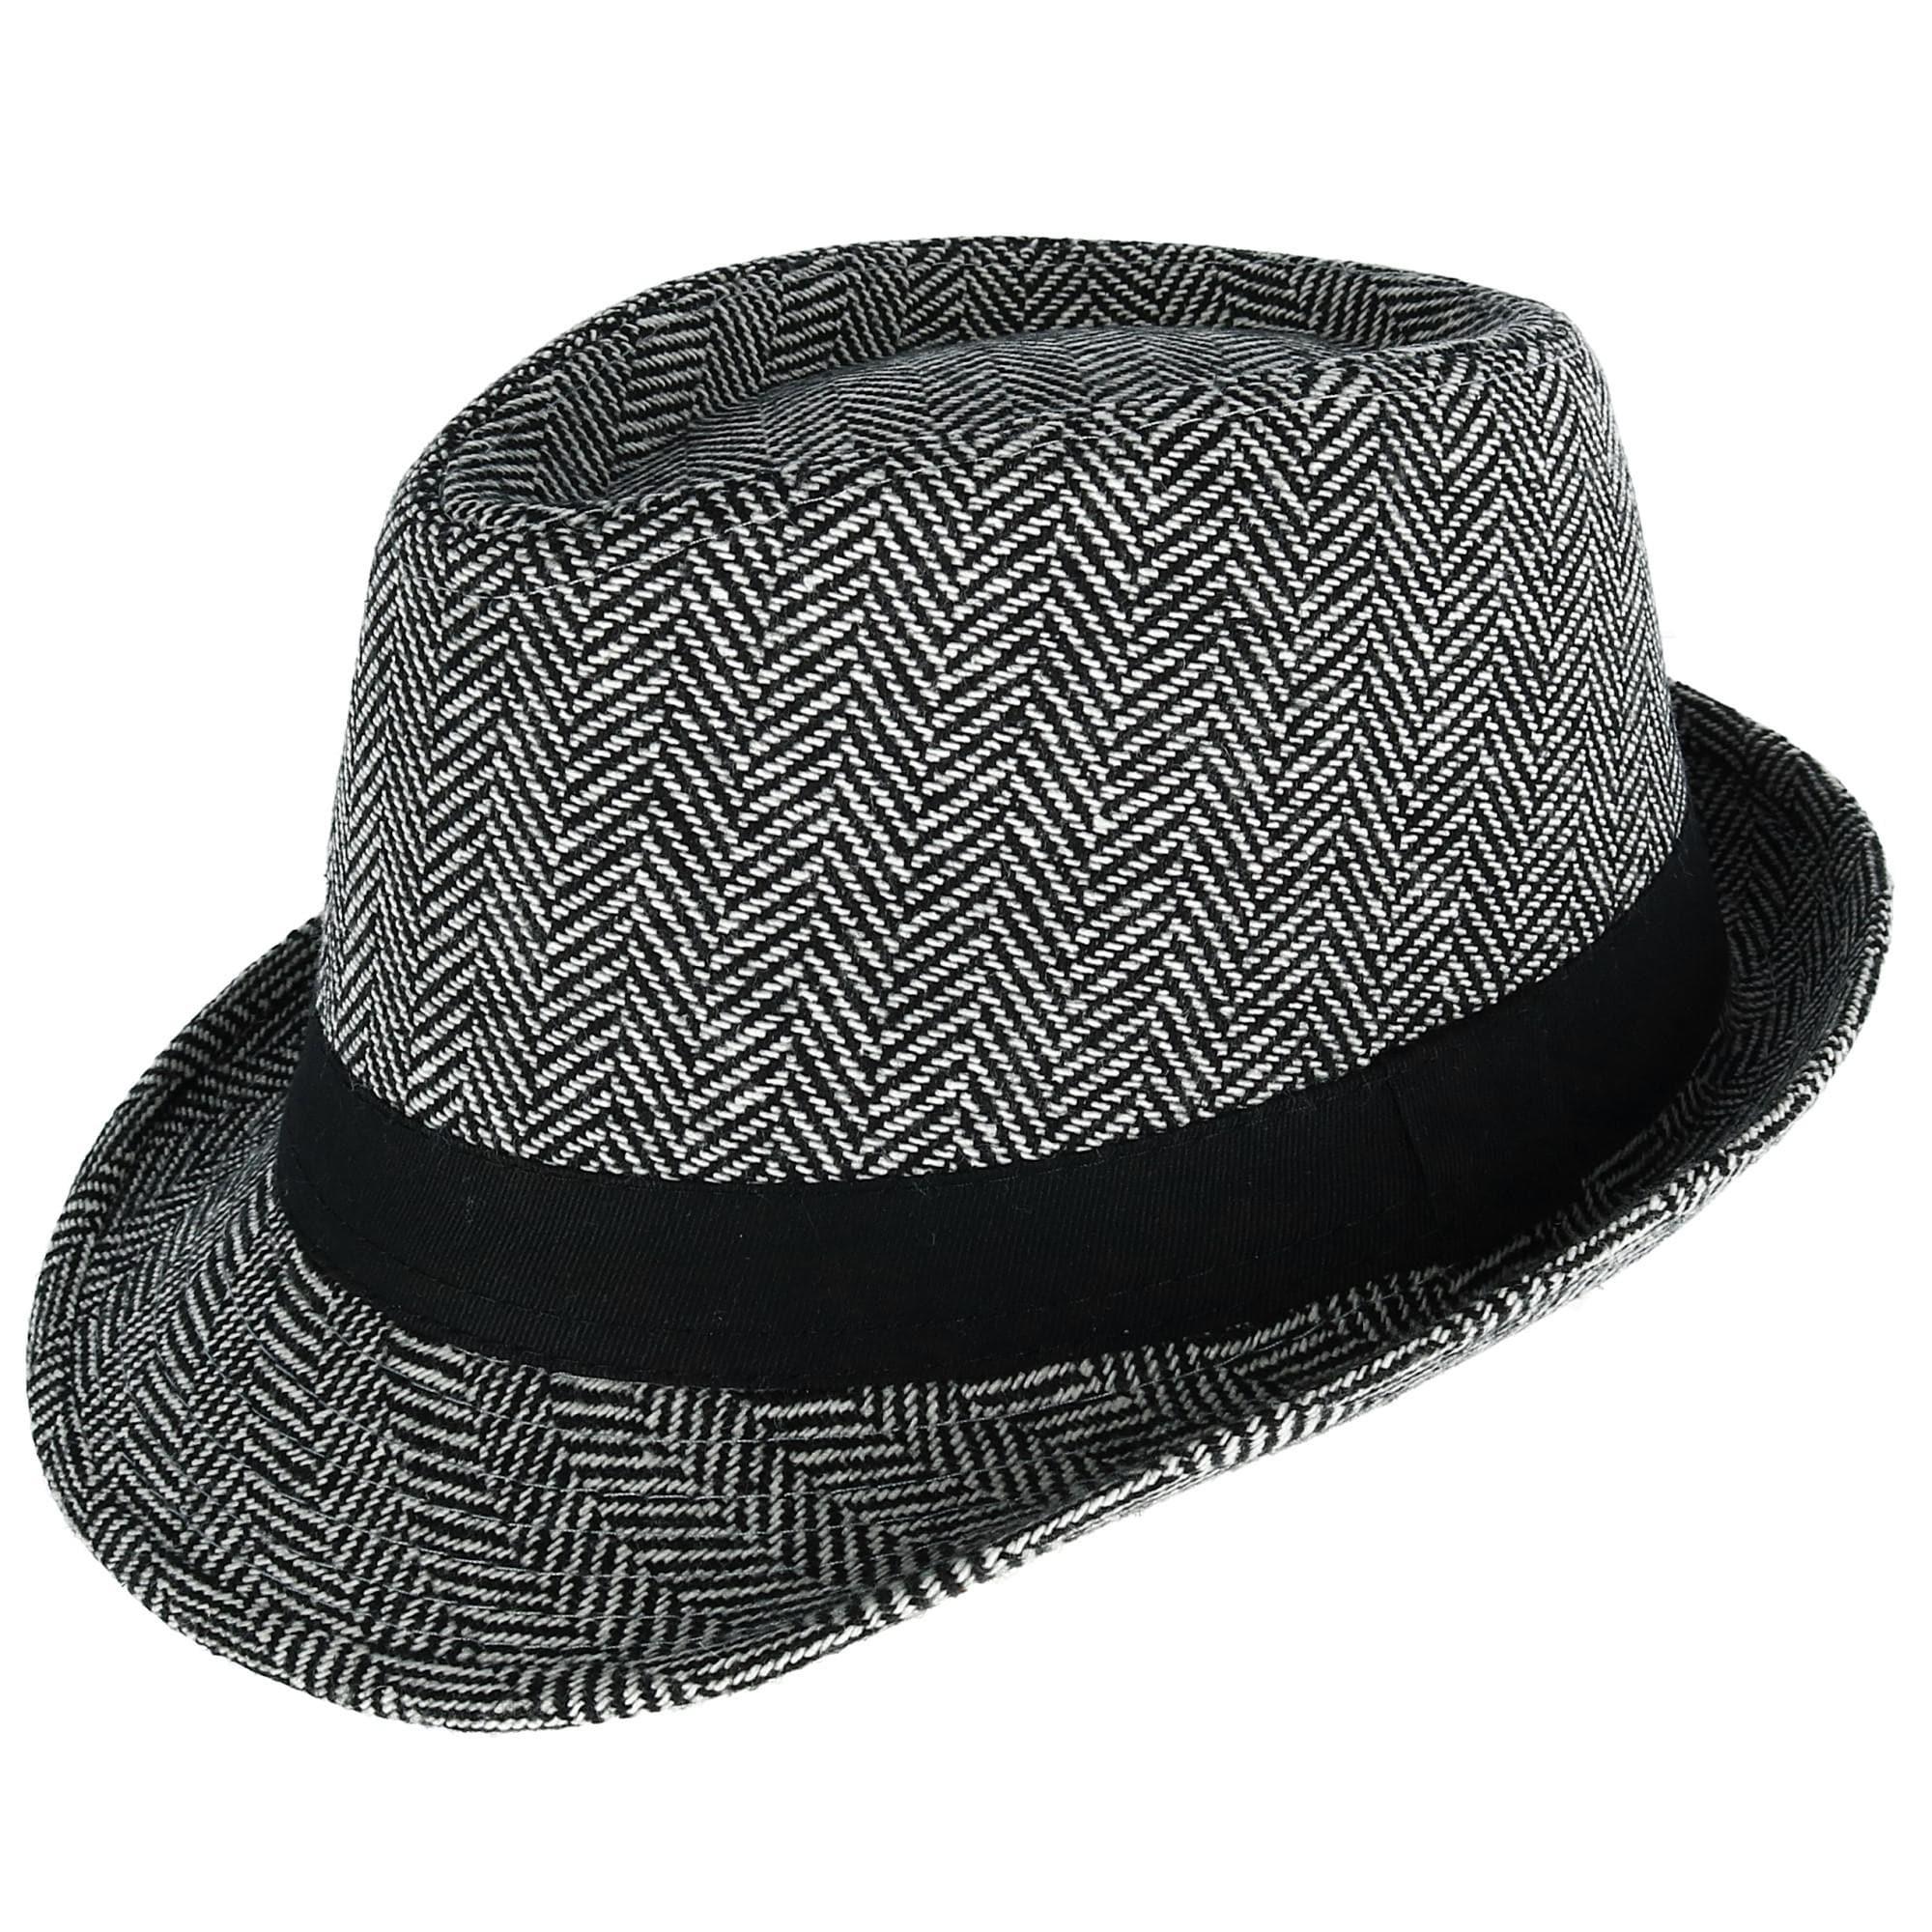 d1f9b3a86 Westend Men's Herringbone Trilby Fedora Hat